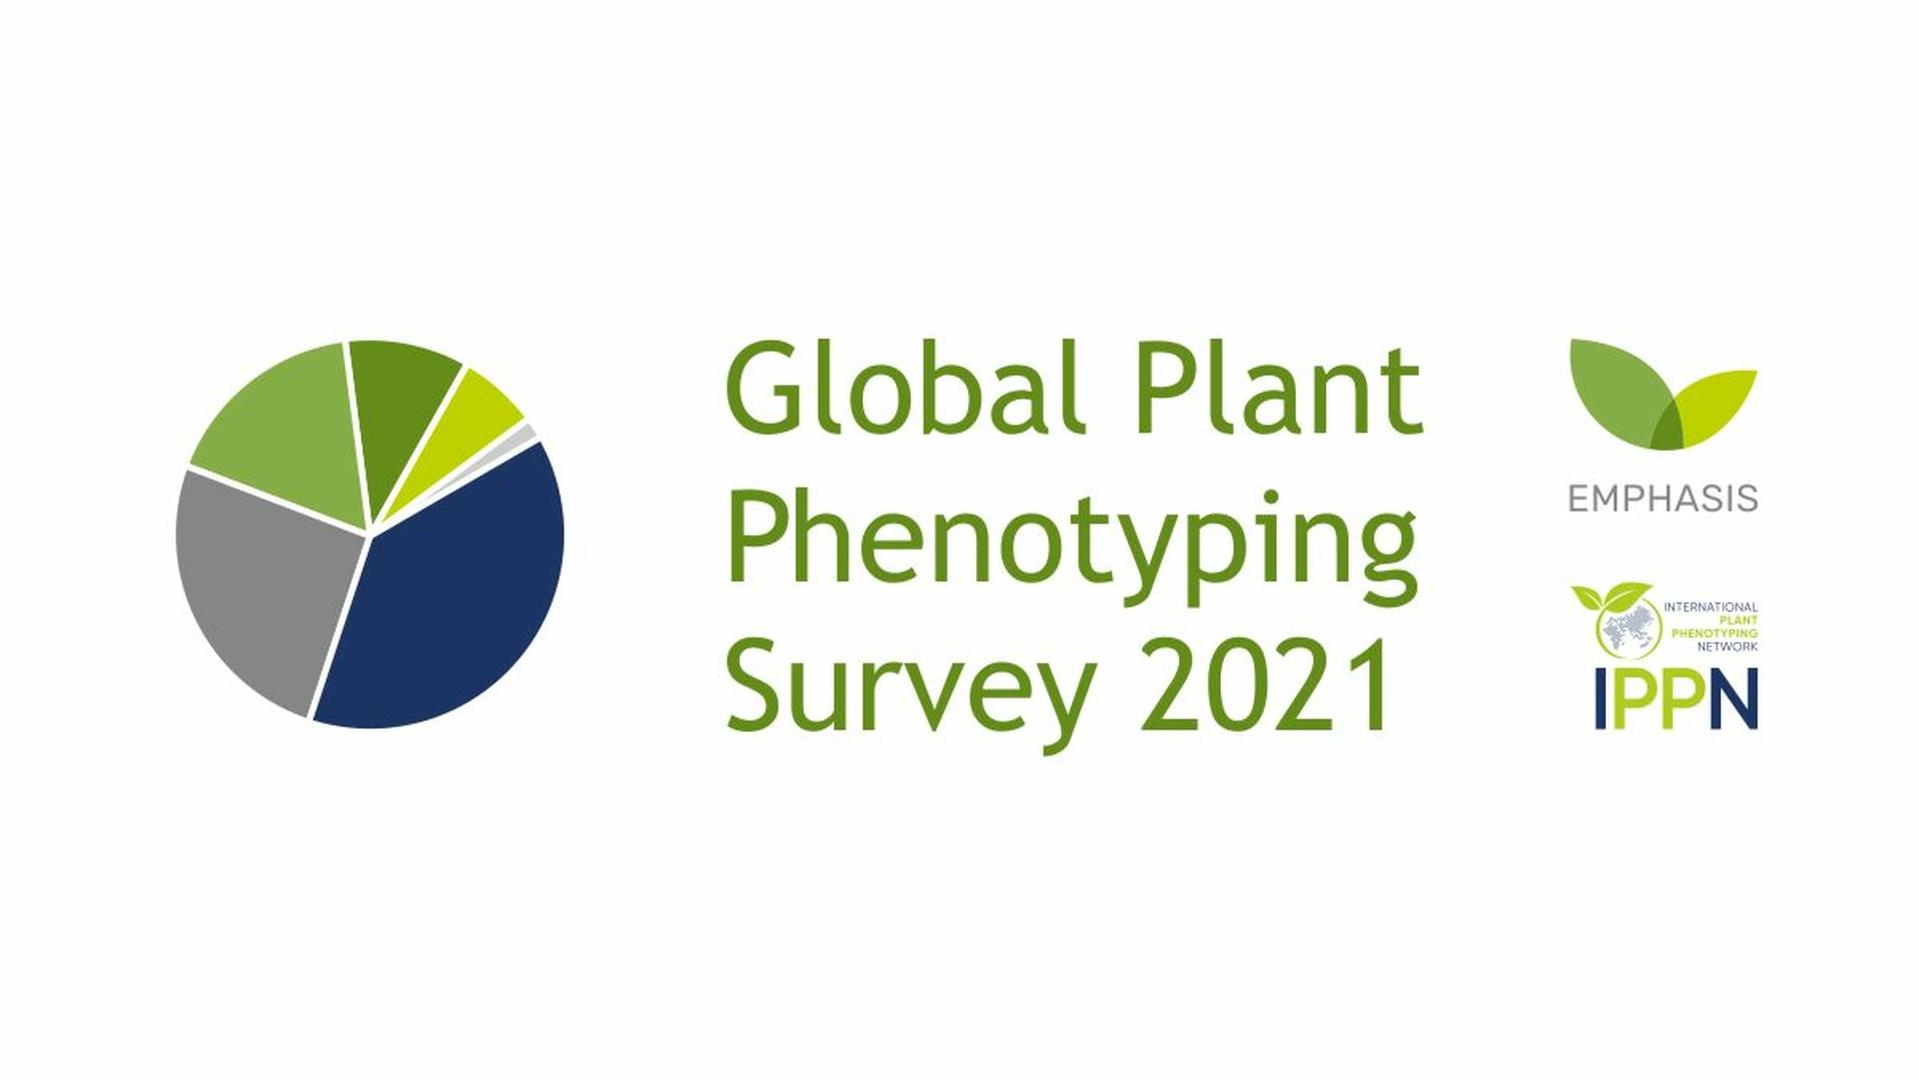 Phenotyping Survey